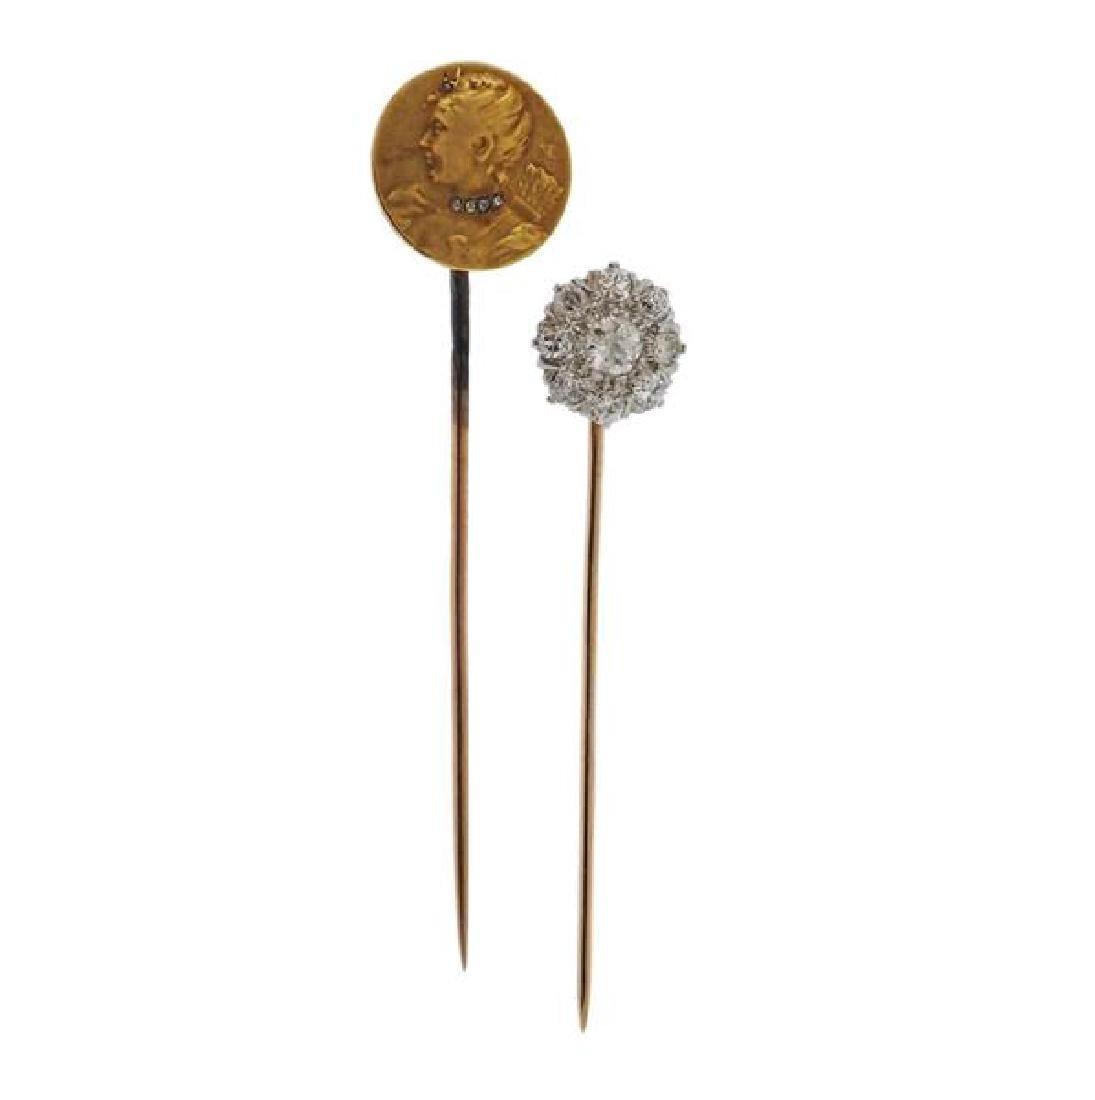 Antique Gold Diamond Stick Pin Lot of 2